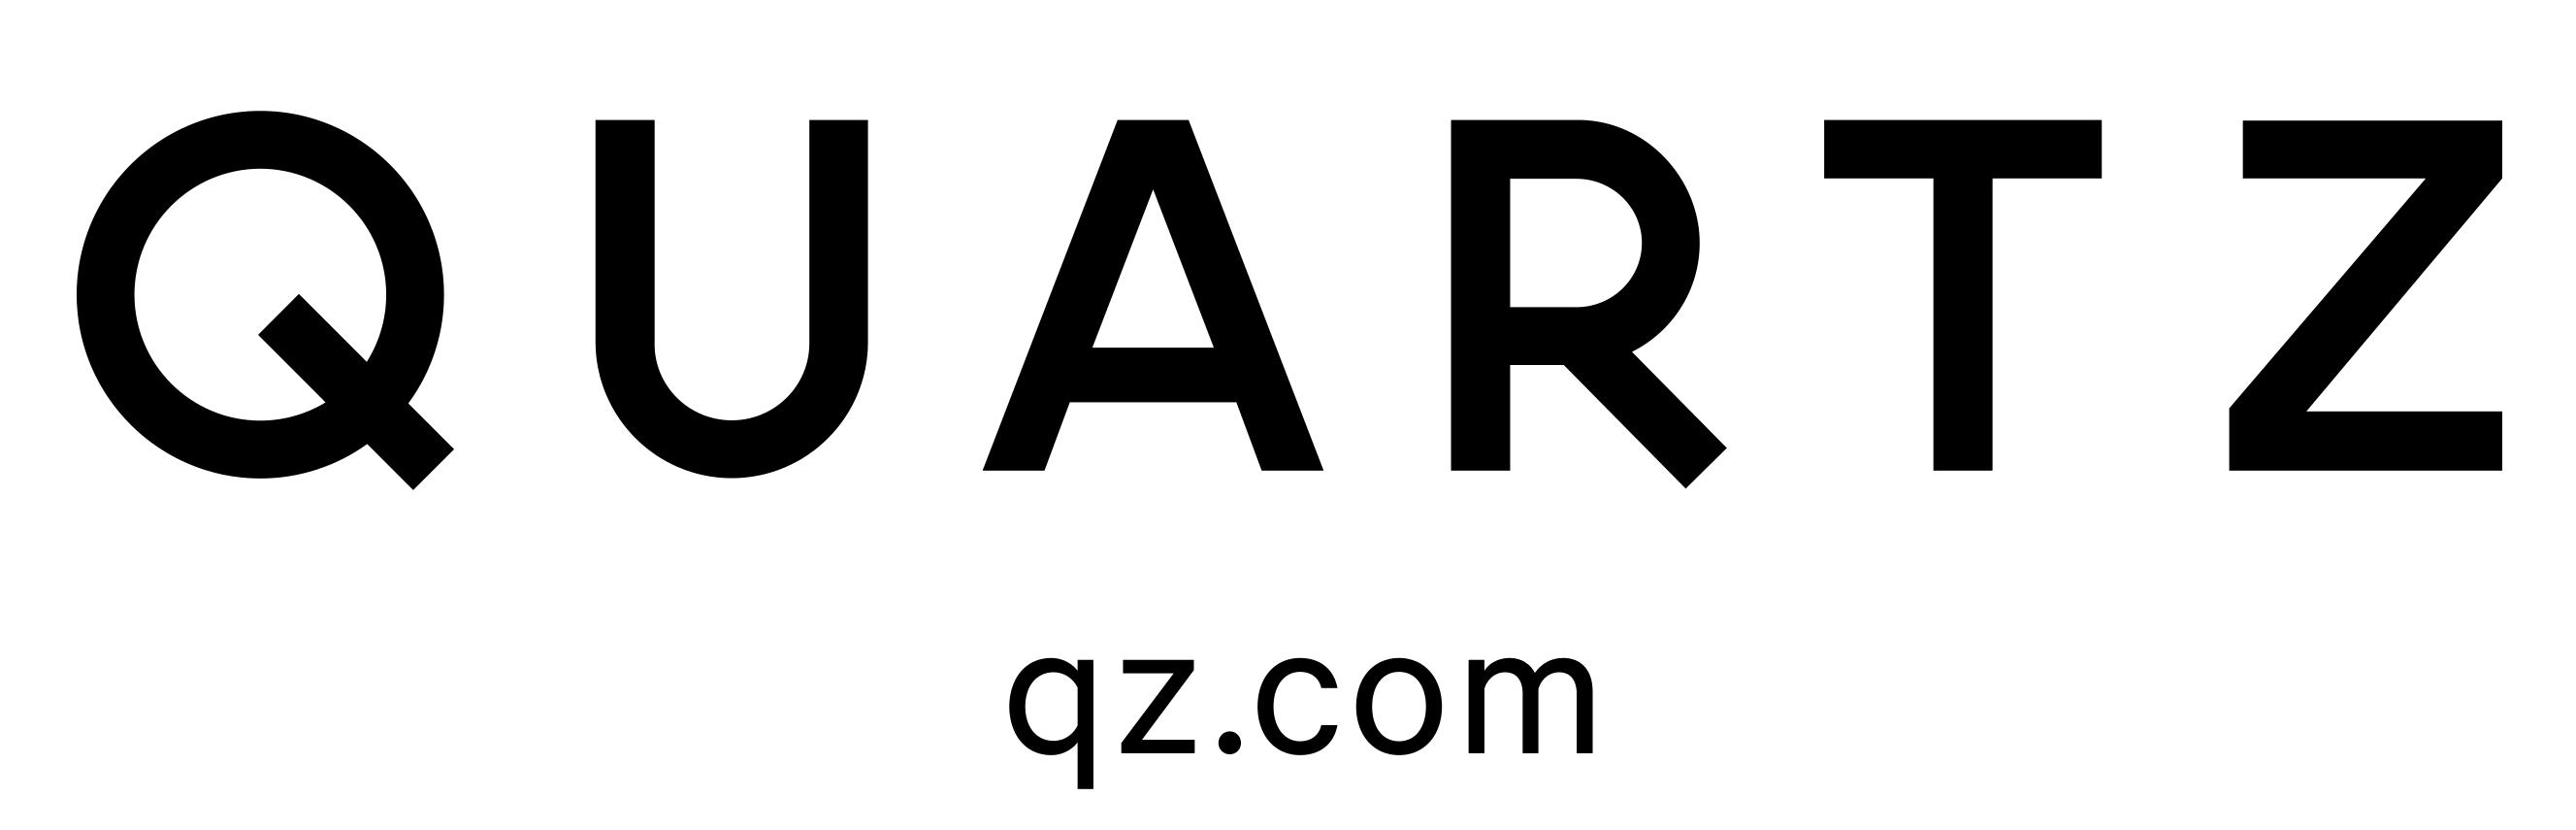 Jeff Bezosu0027 Blue Origin is building a huge rocket factory in Florida - Logo Blue Origin PNG